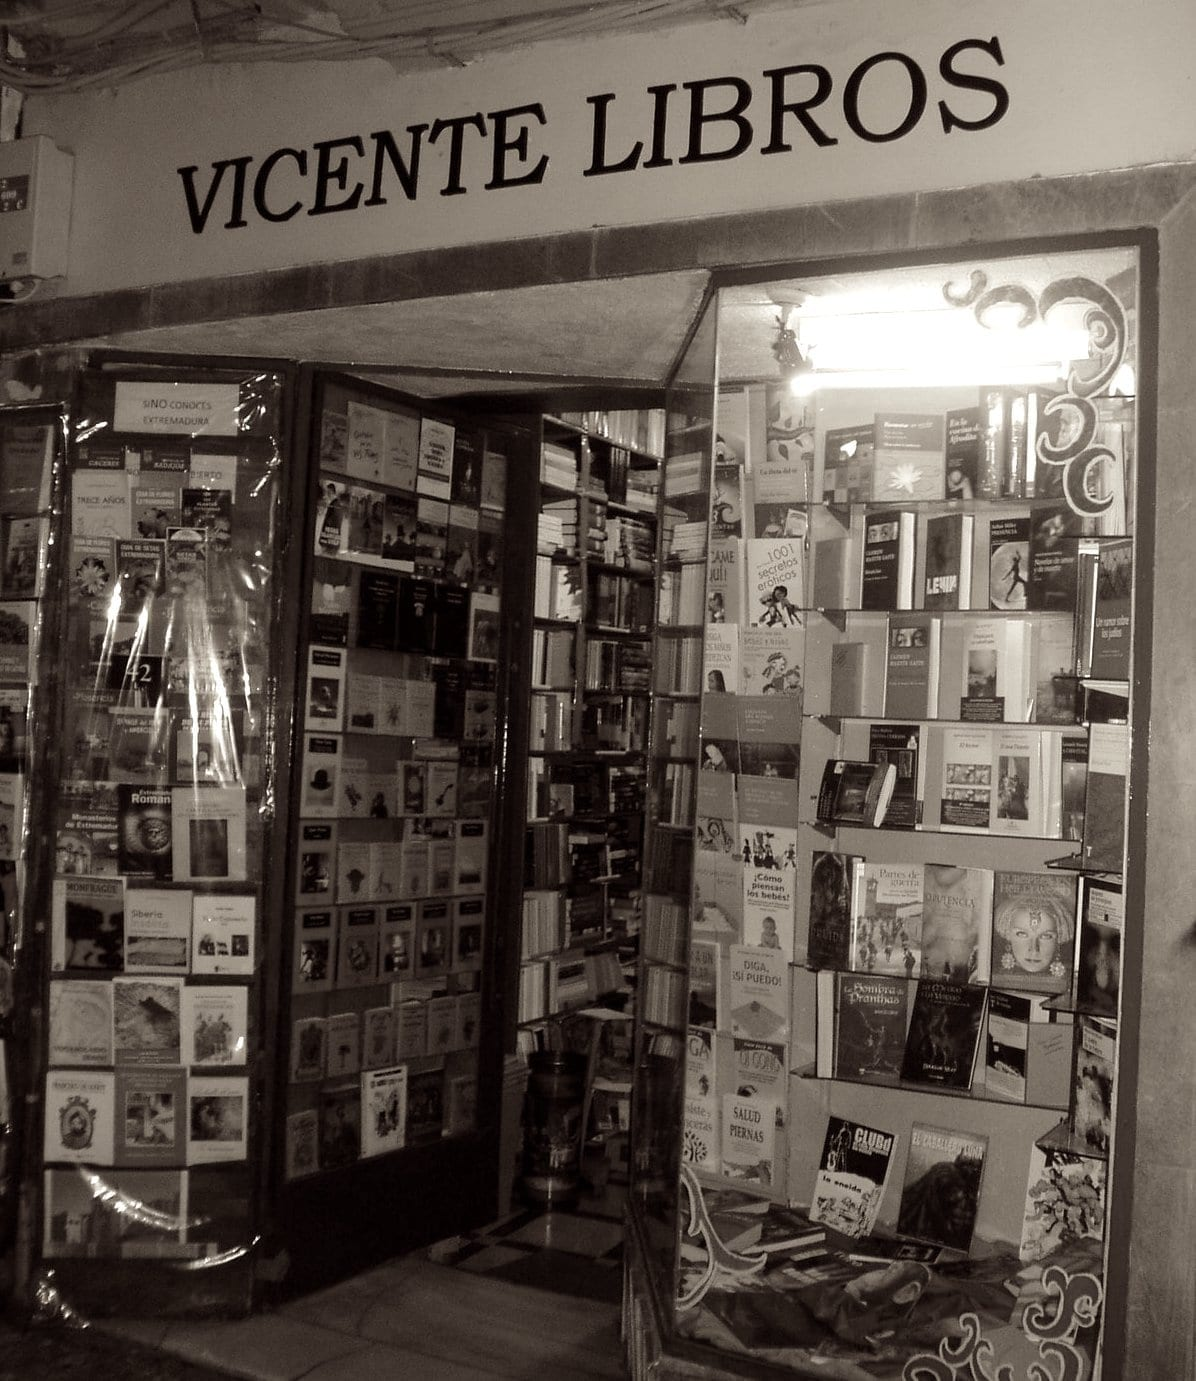 Librería Vicente en Pintores